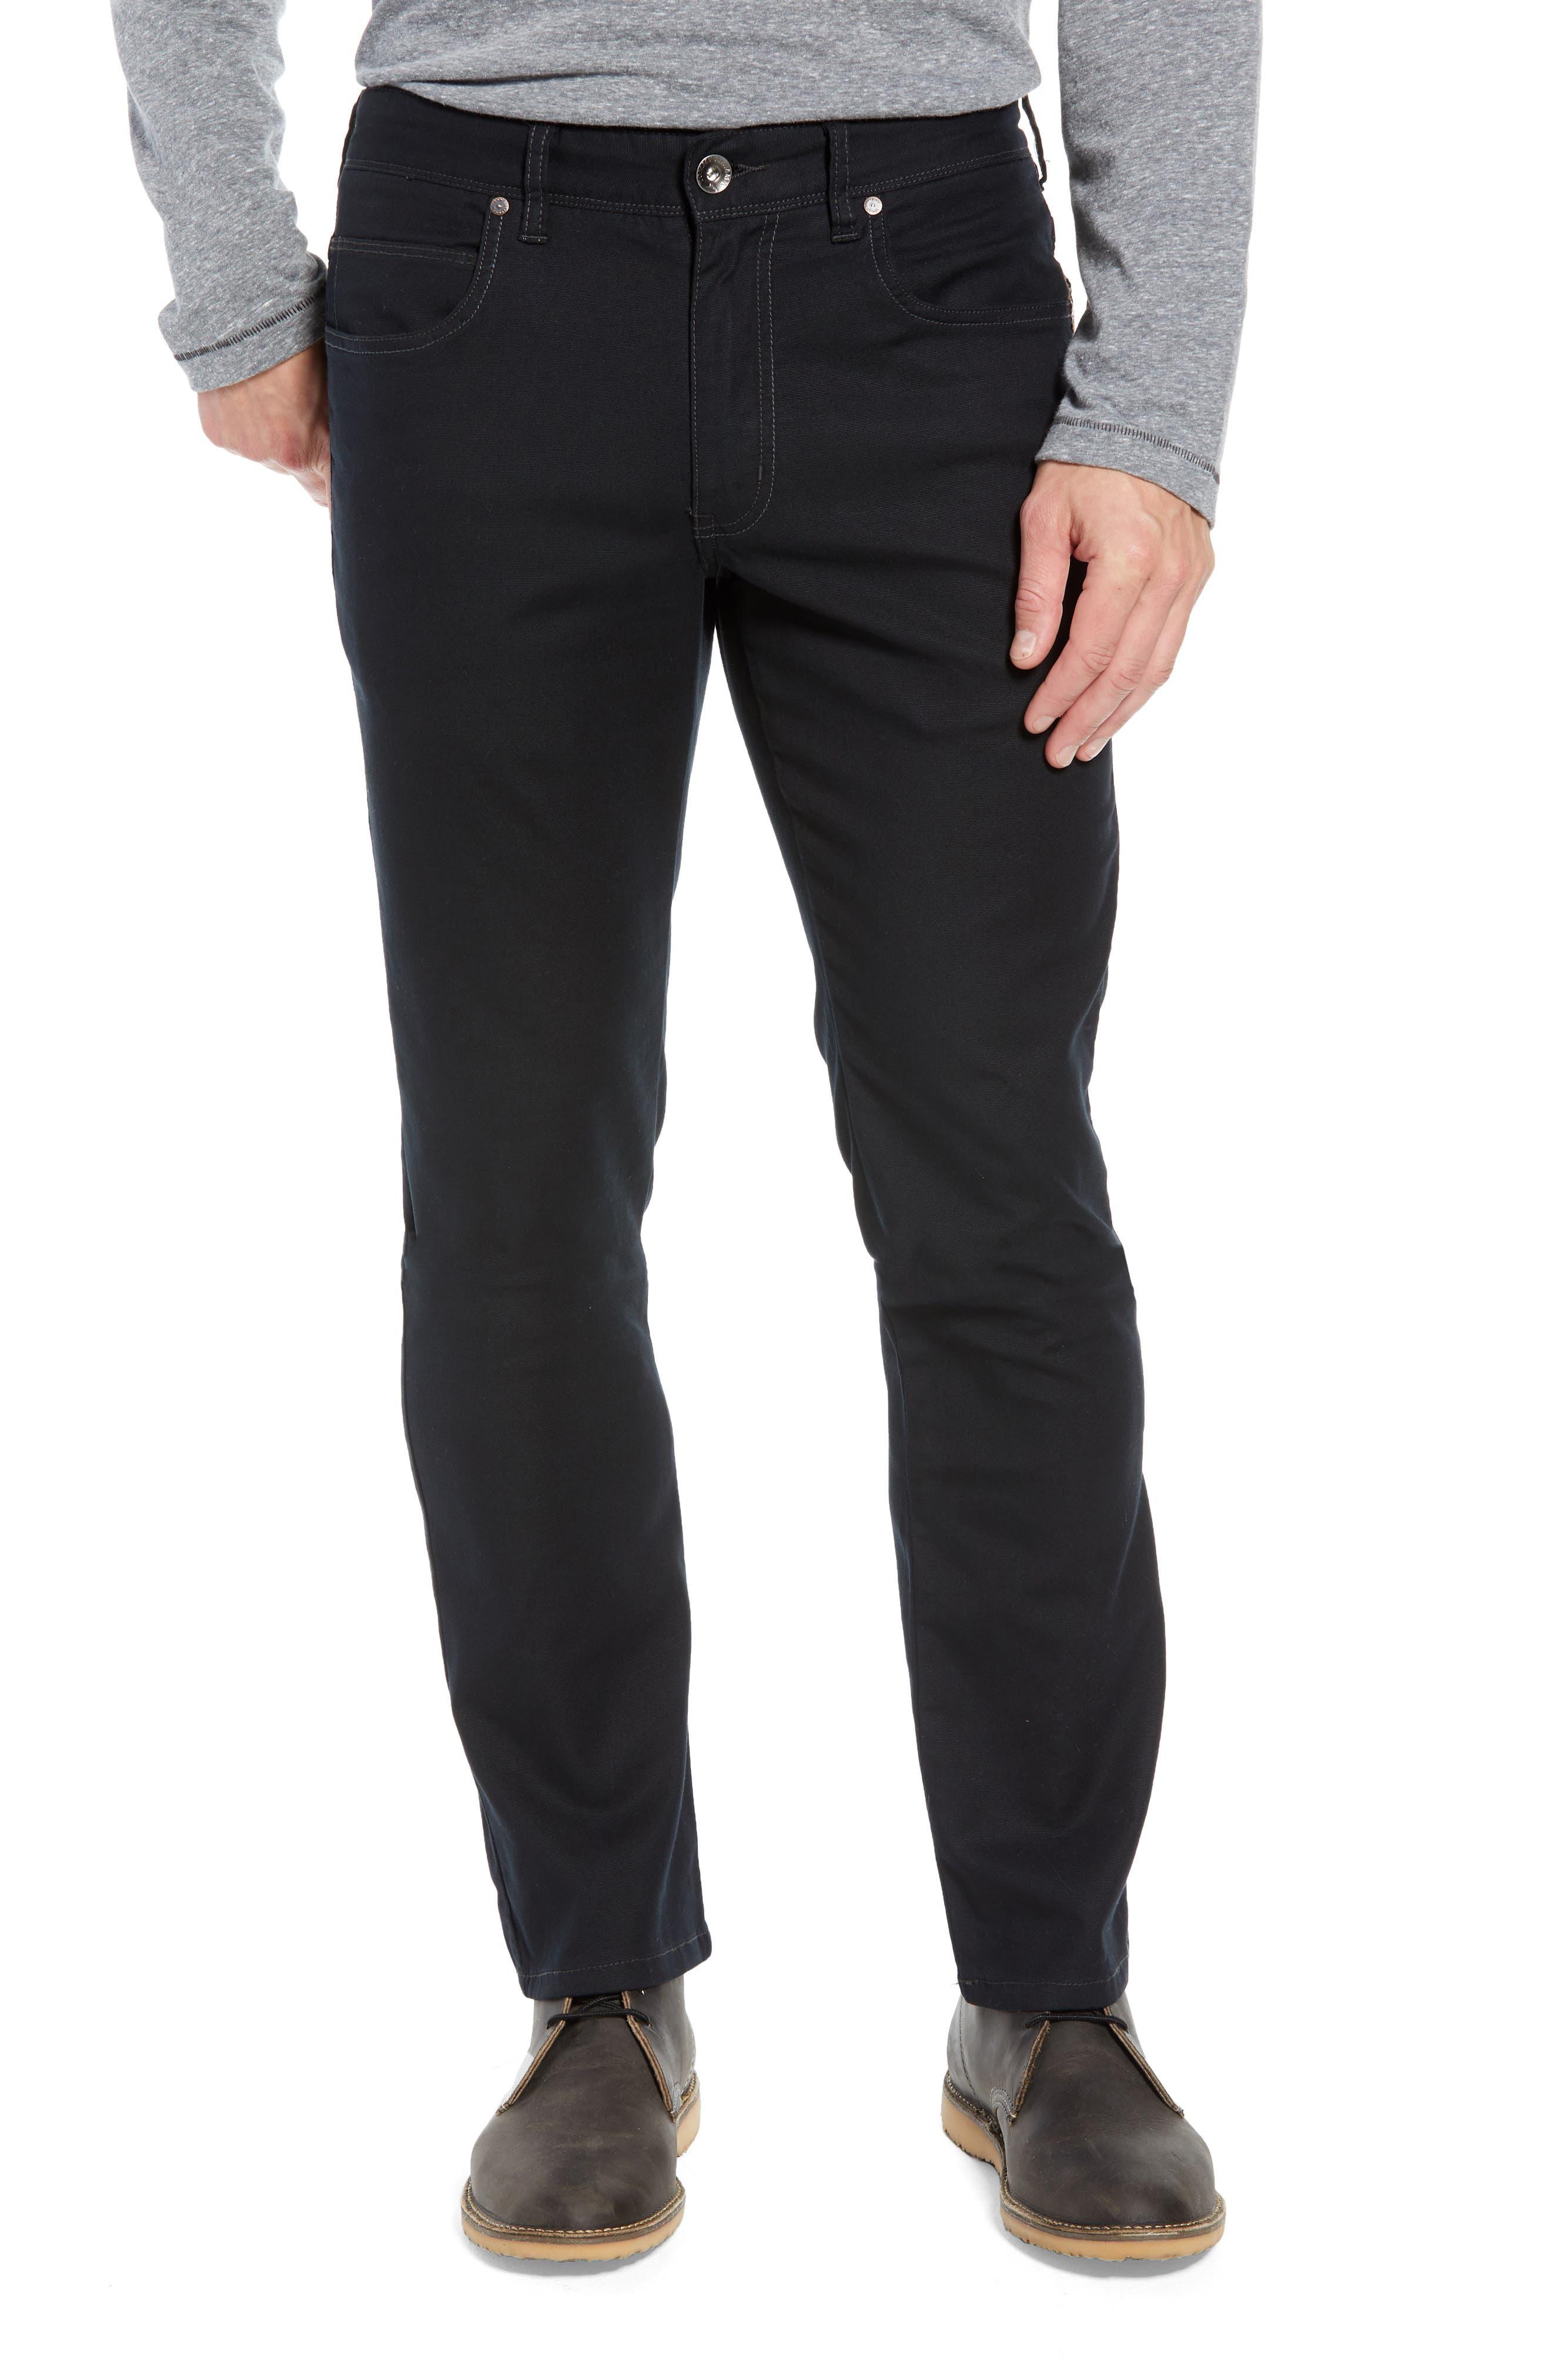 Key Isles Regular Fit Pants,                             Main thumbnail 1, color,                             BLACK